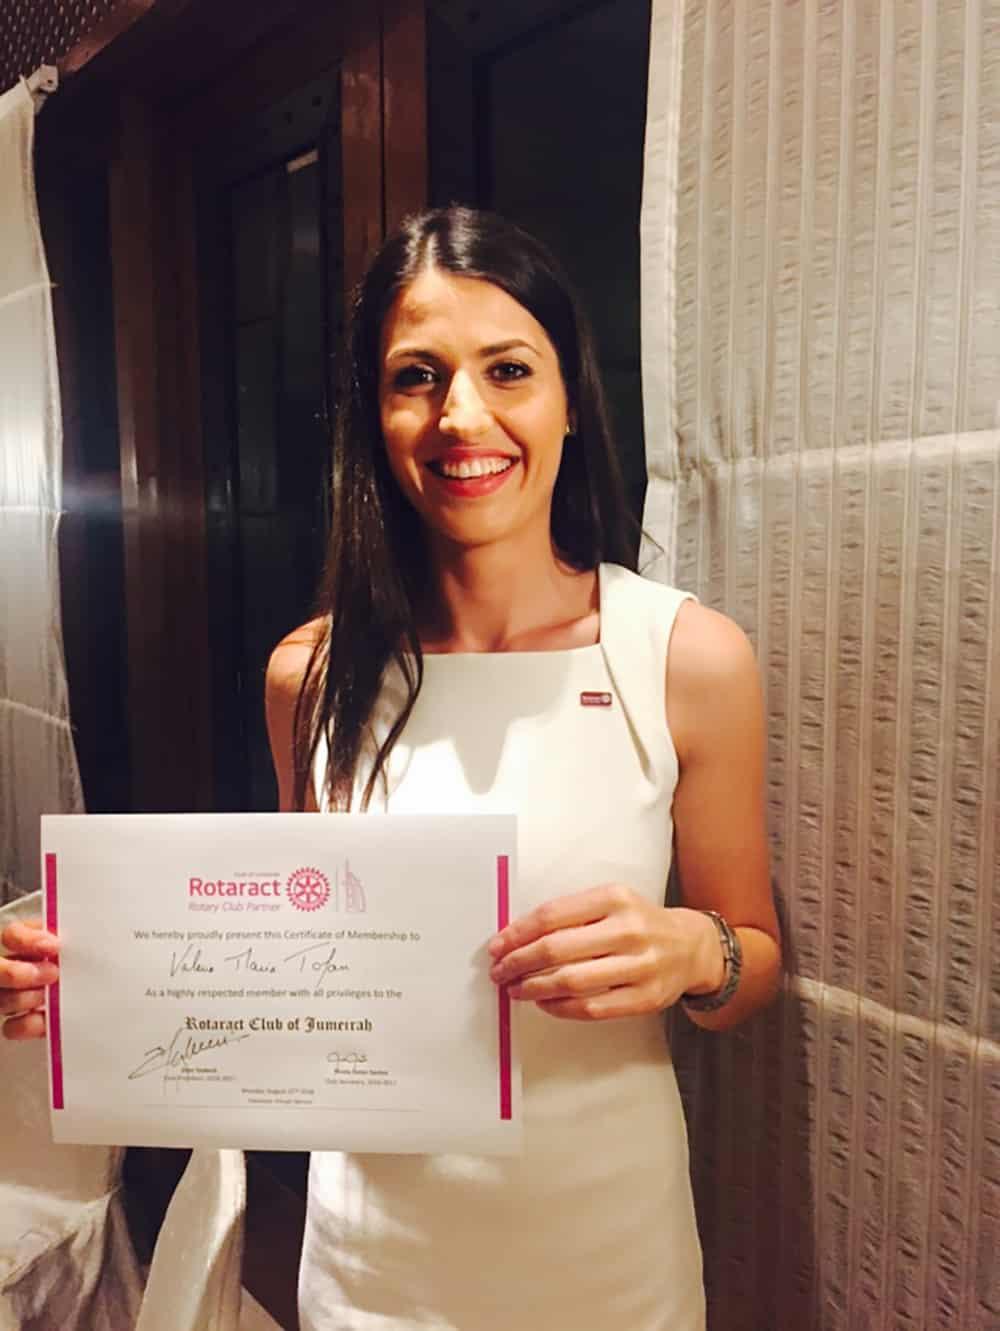 Maria-Valeria-Tofan-awards